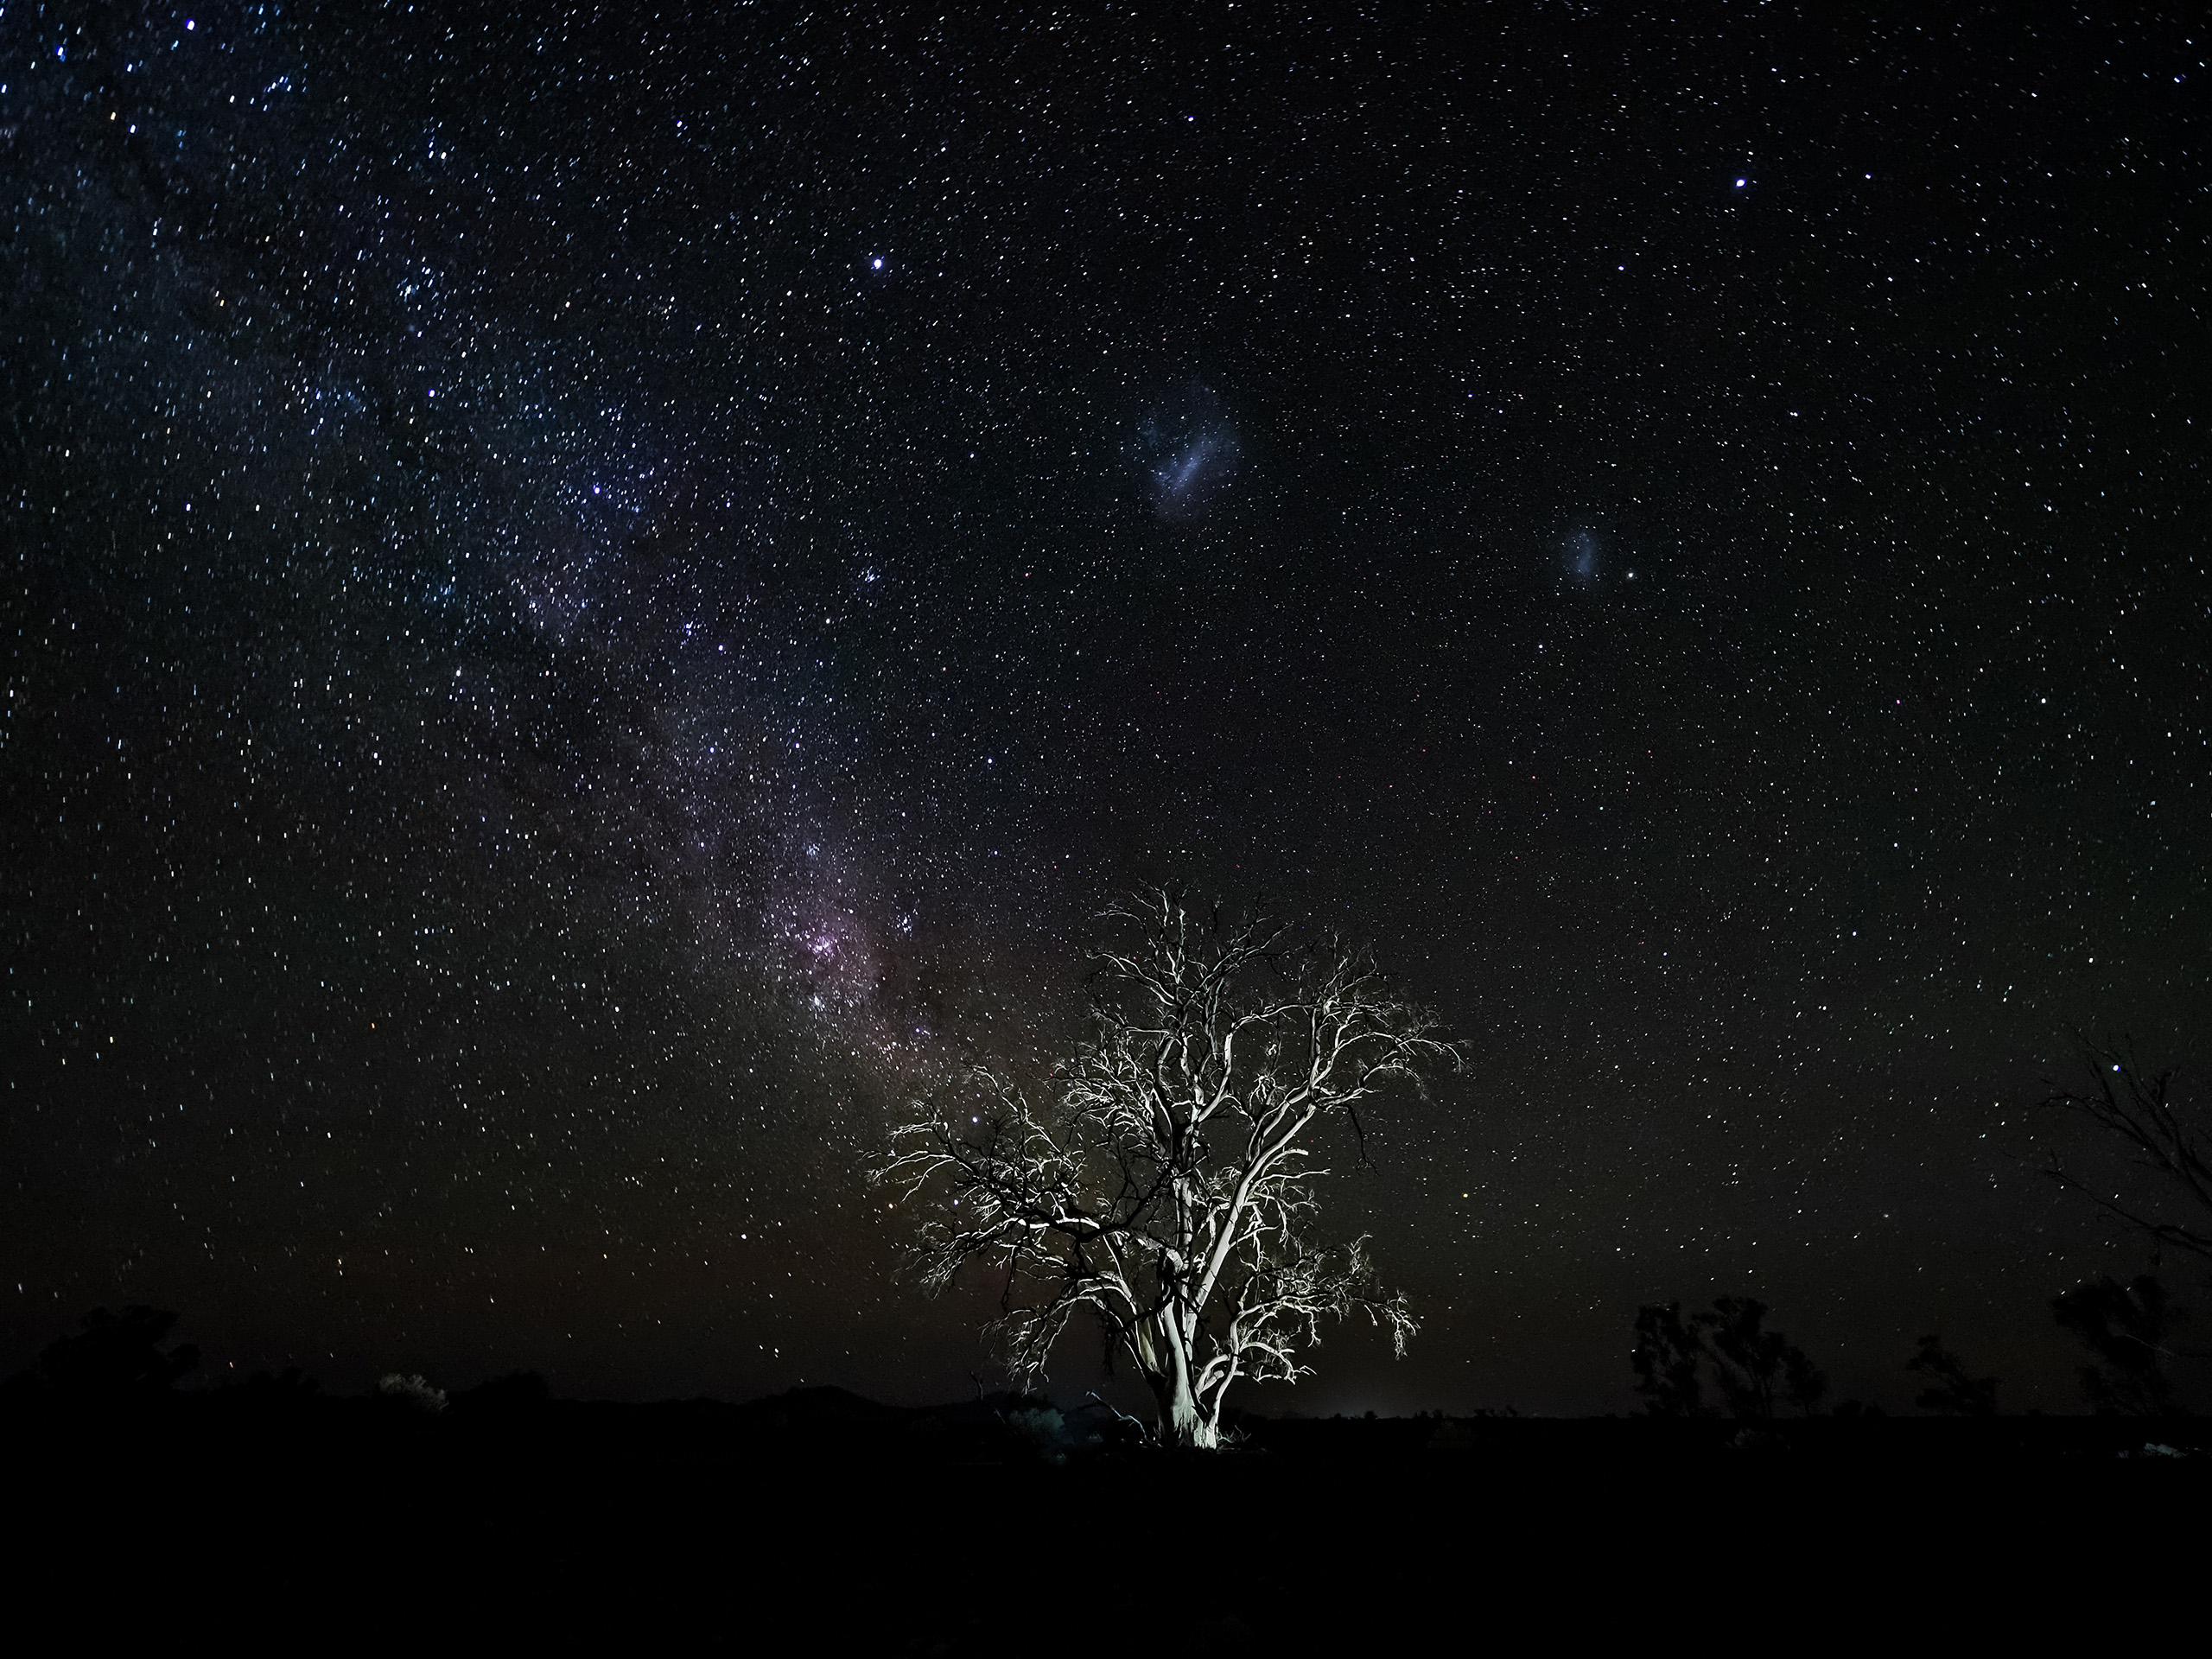 Tree lit up against starry night sky, photographed using Olympus OM-D E-M1 Mk III + M.Zuiko Digital ED 7-14mm f2.8 PRO lens